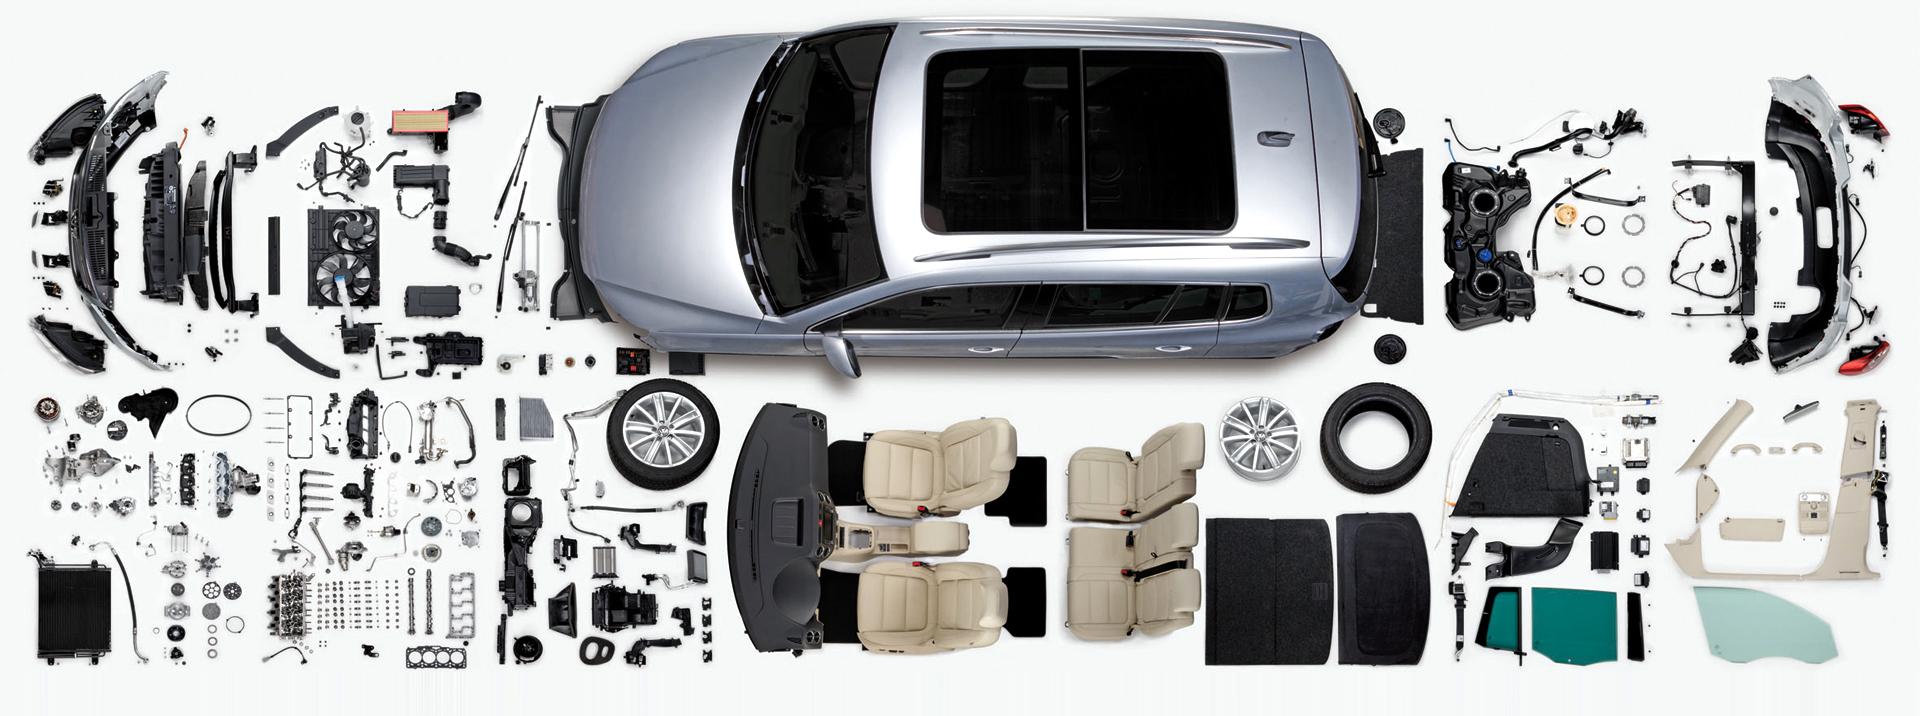 Universal Car Accessories Uk